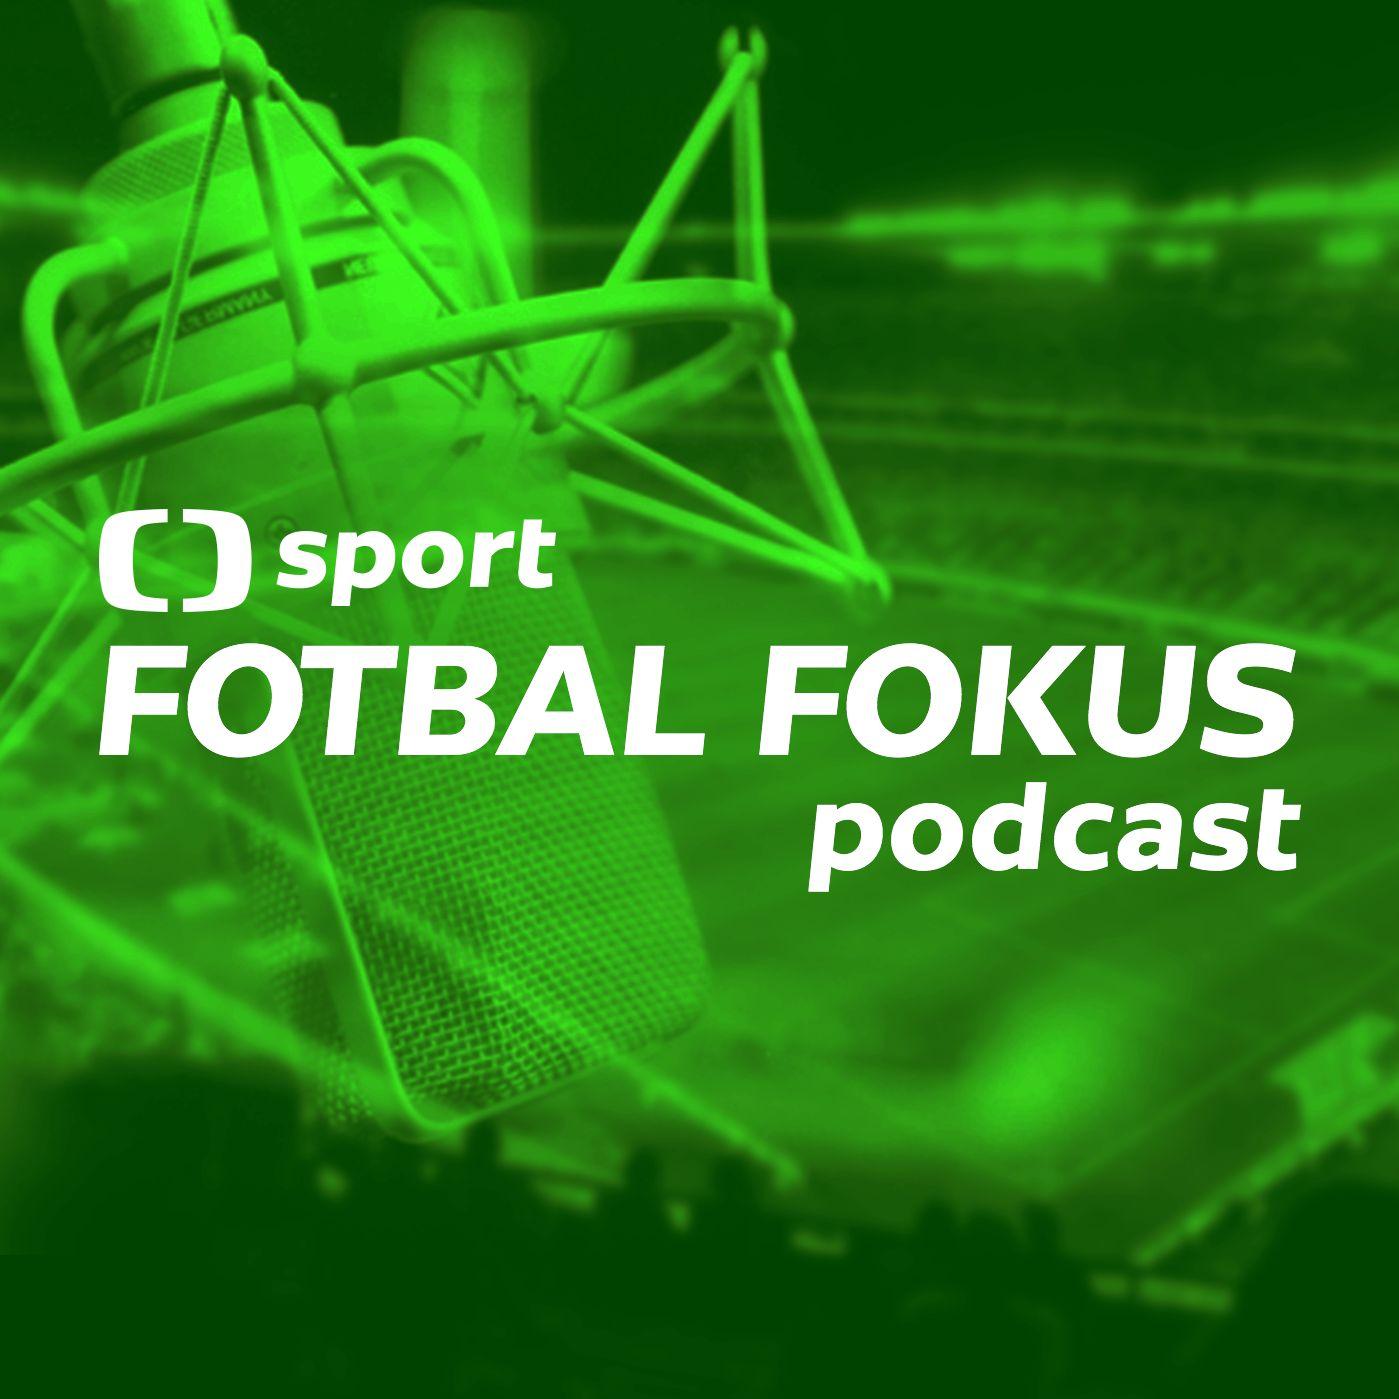 Fotbal fokus podcast: Má Vrba blíže do Sparty, anebo k návratu do Plzně?